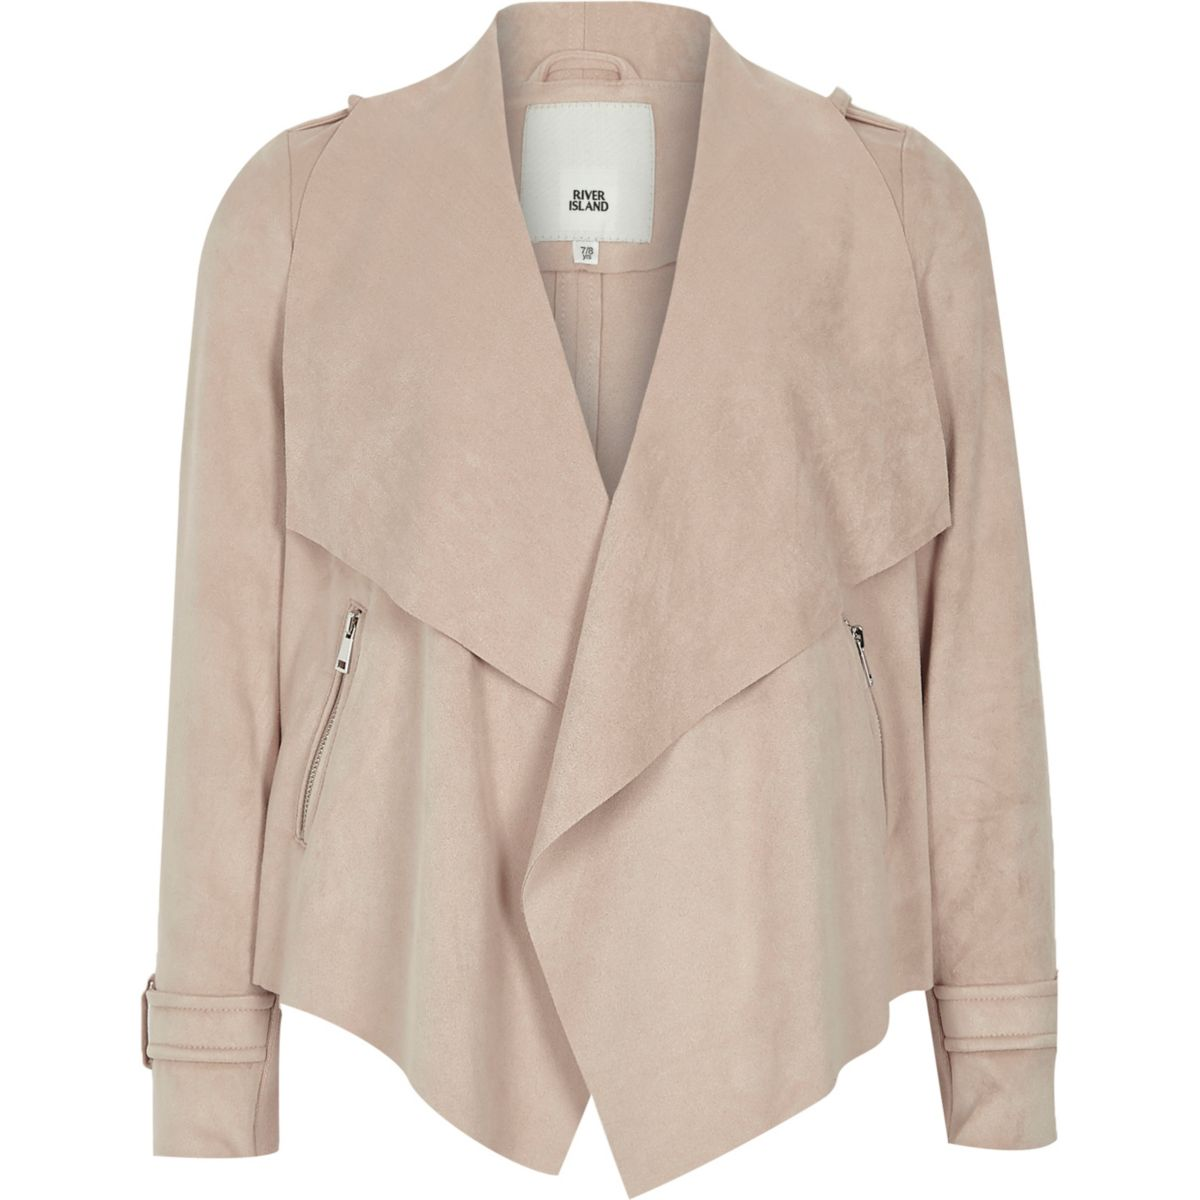 Girls cream faux suede waterfall jacket